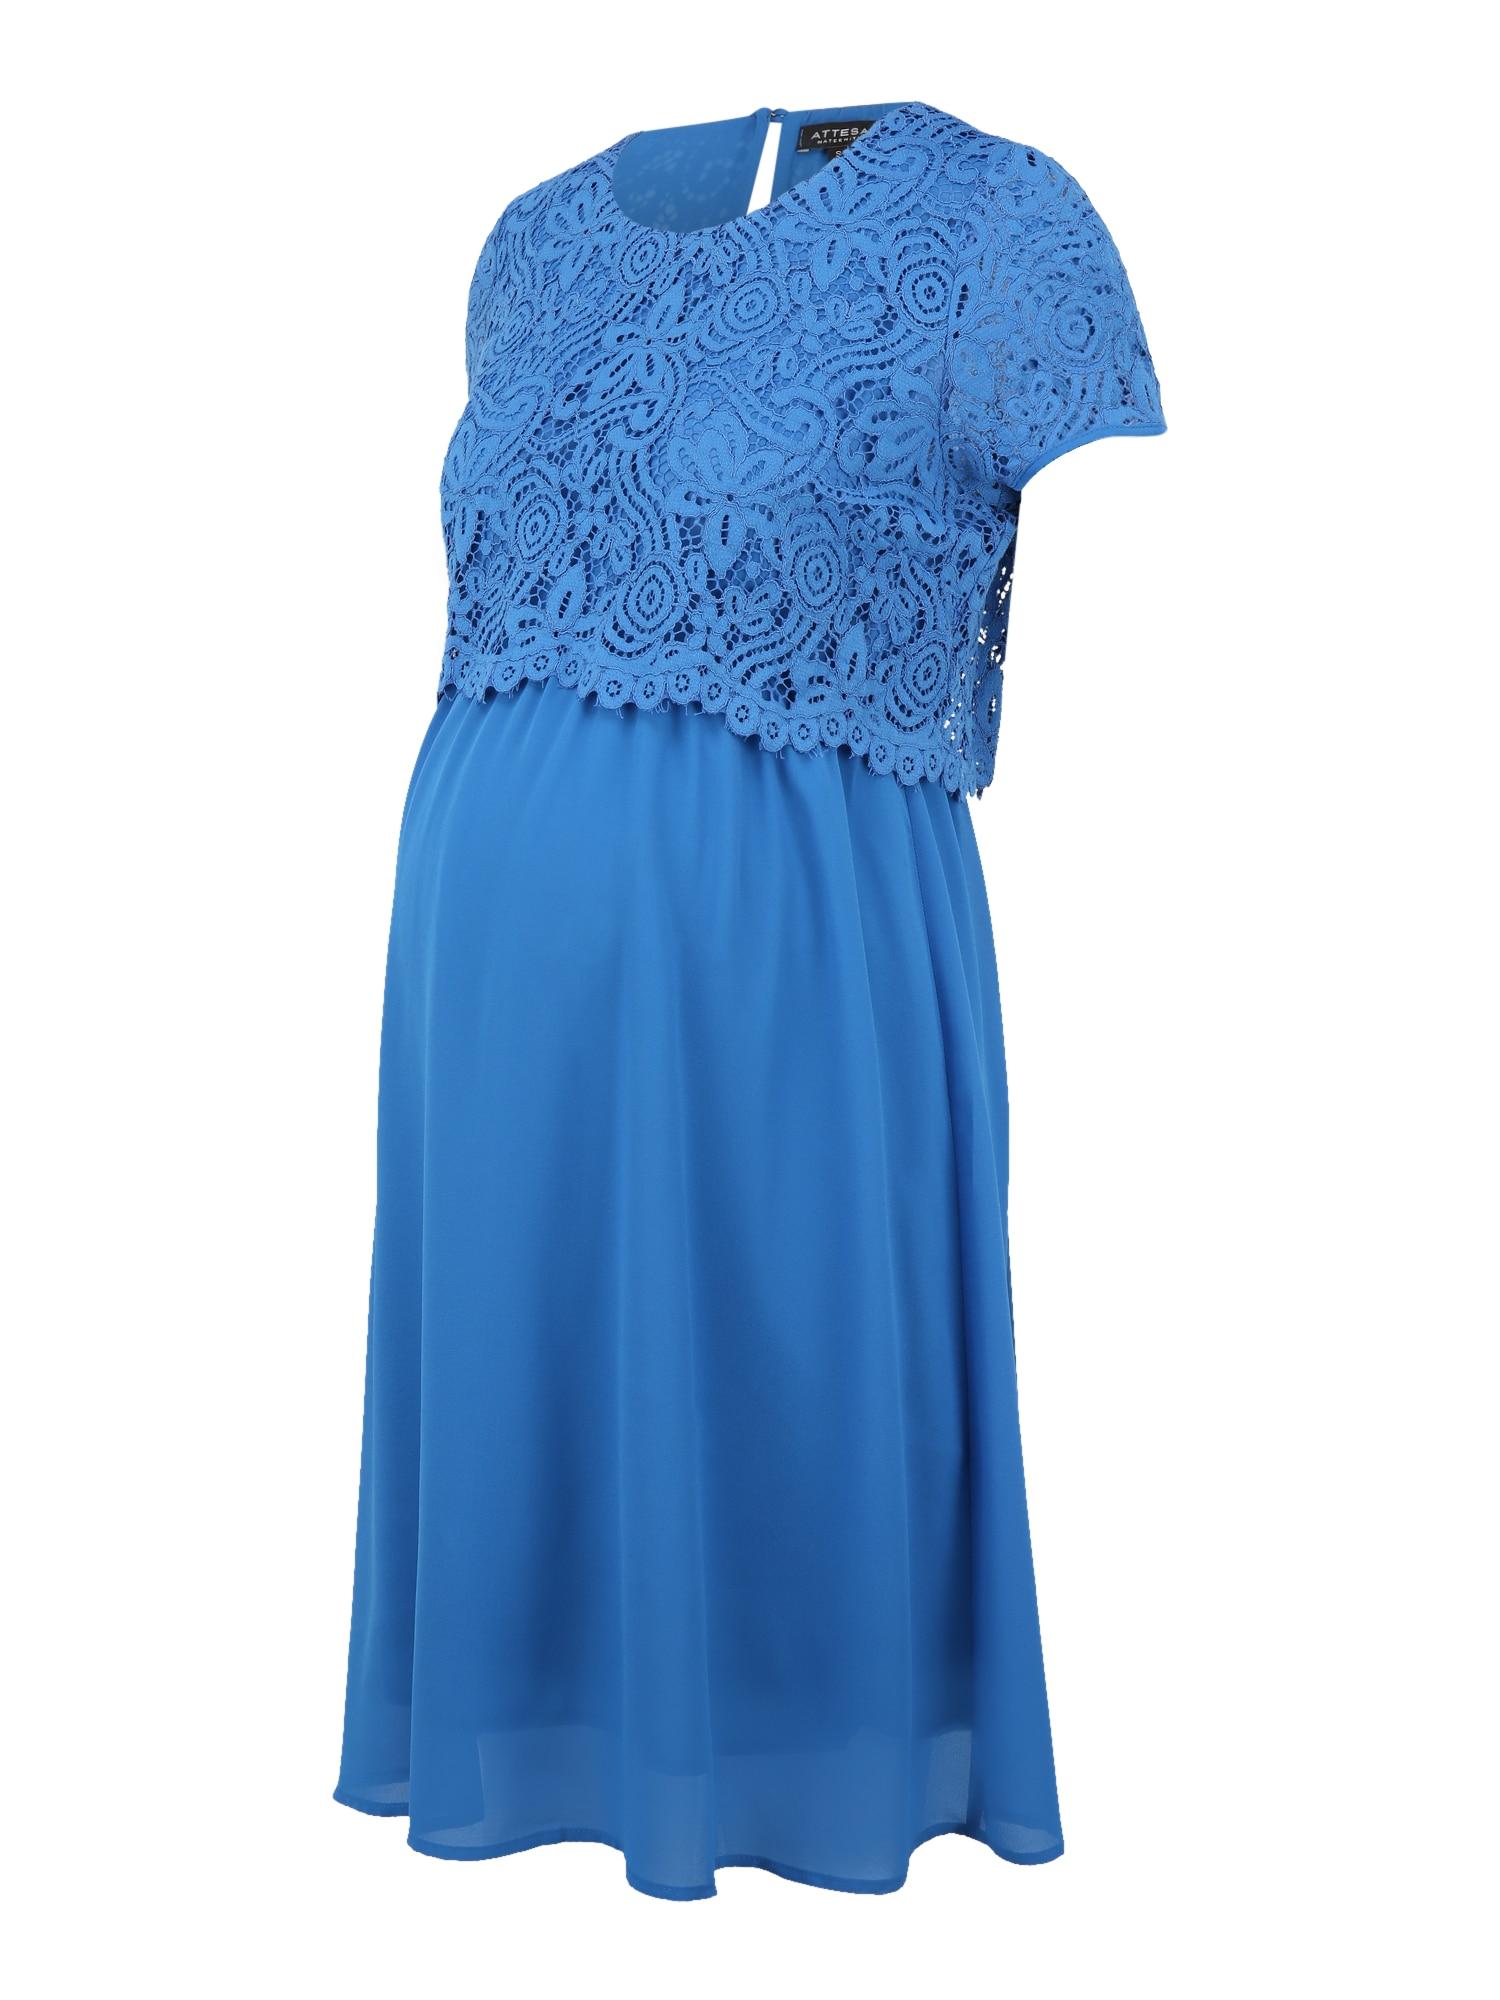 "Attesa Kokteilinė suknelė sodri mėlyna (""karališka"")"